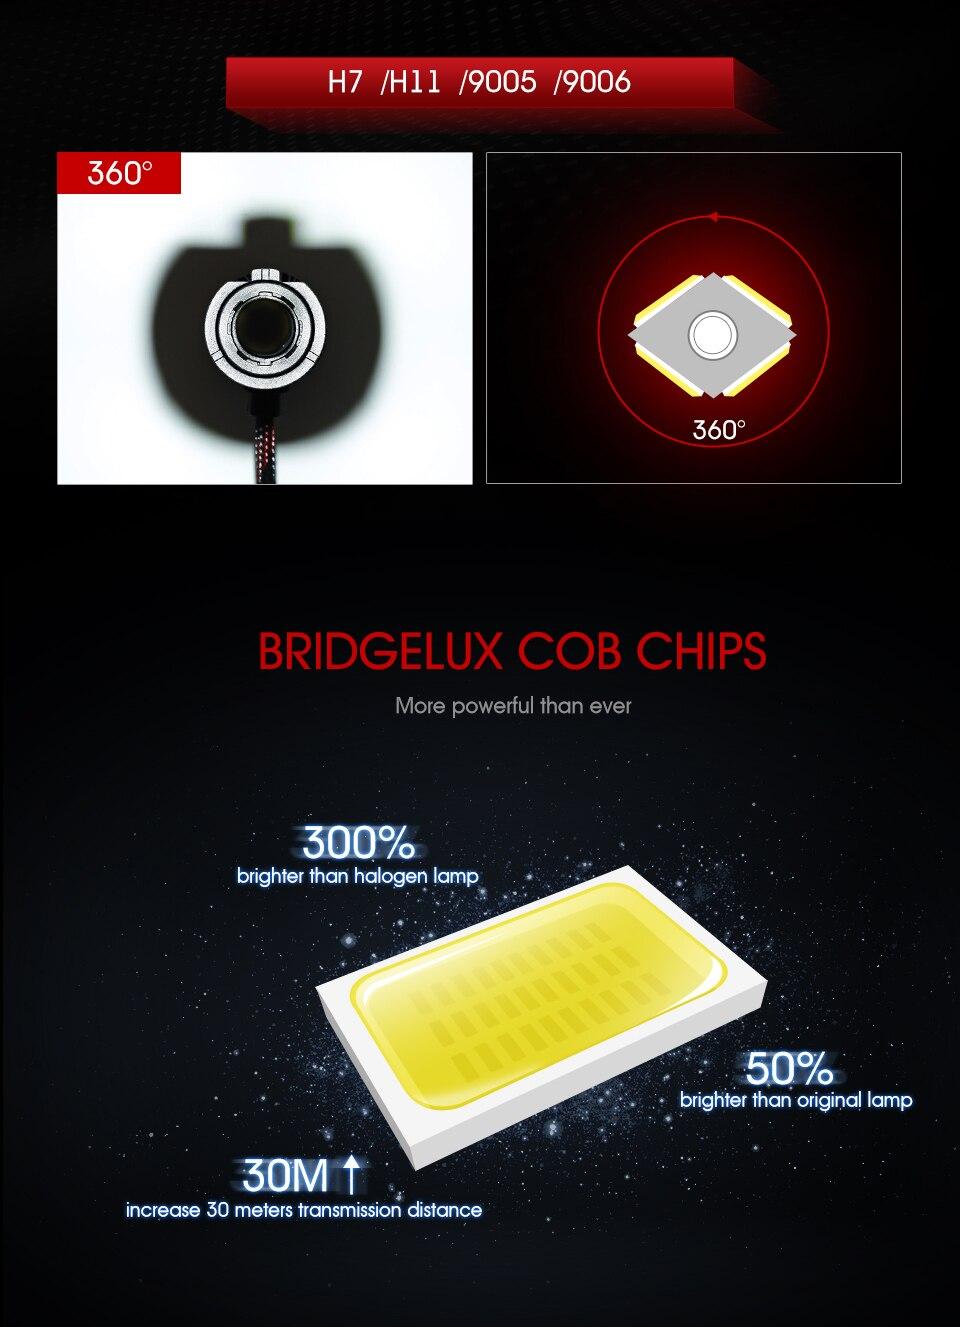 Oslamp New 4 Side Lumens Cob 100w 10000lm H4 Hi Lo H7 H11 9005 9006 Headlight Relay Wiring Diagram X7 01 02 03